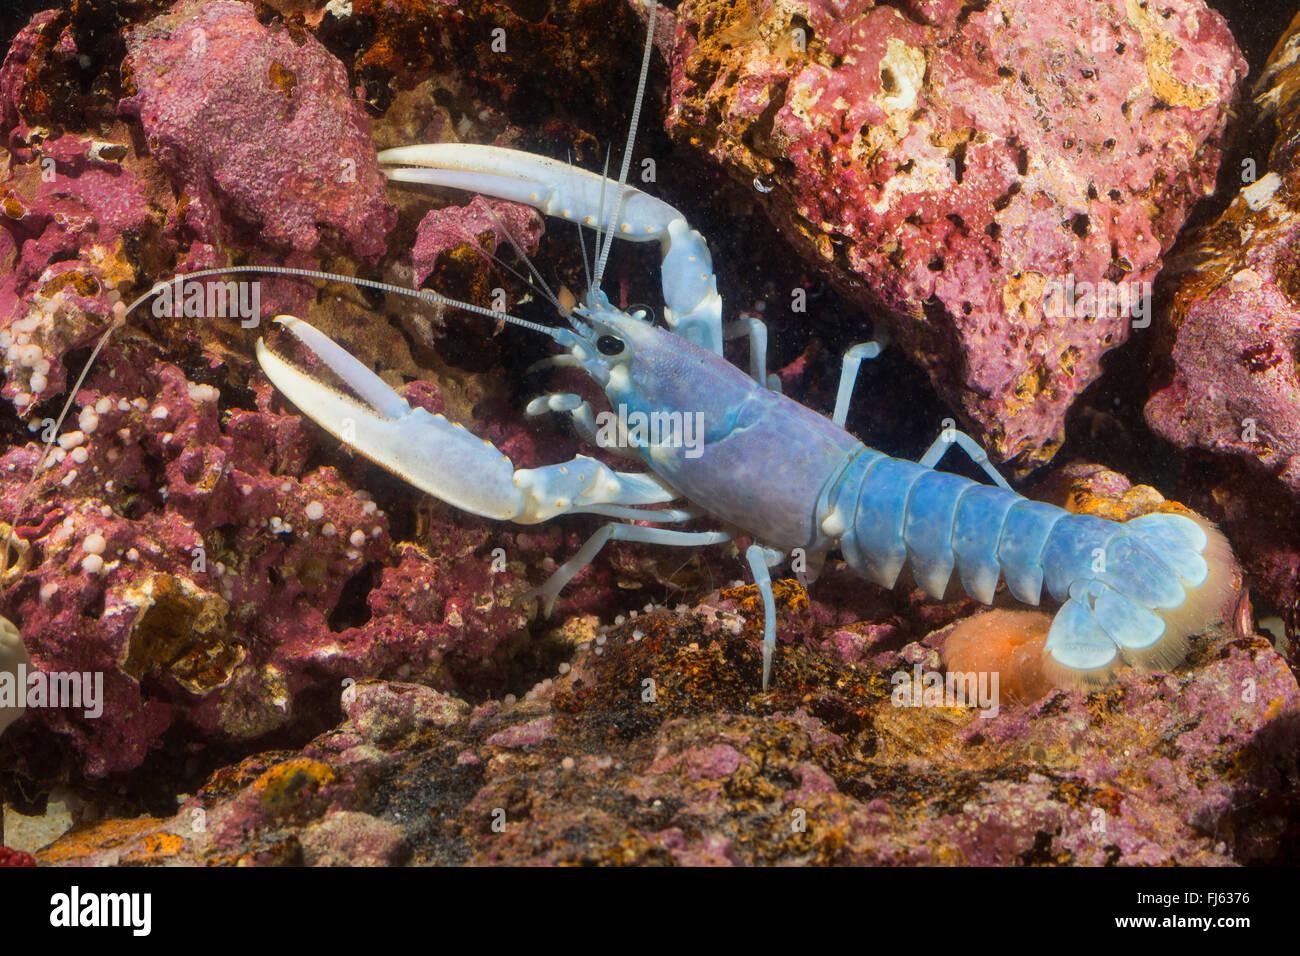 common lobster, European clawed lobster, Maine lobster (Homarus gammarus, Homarus vulgaris), on stones - Stock Image